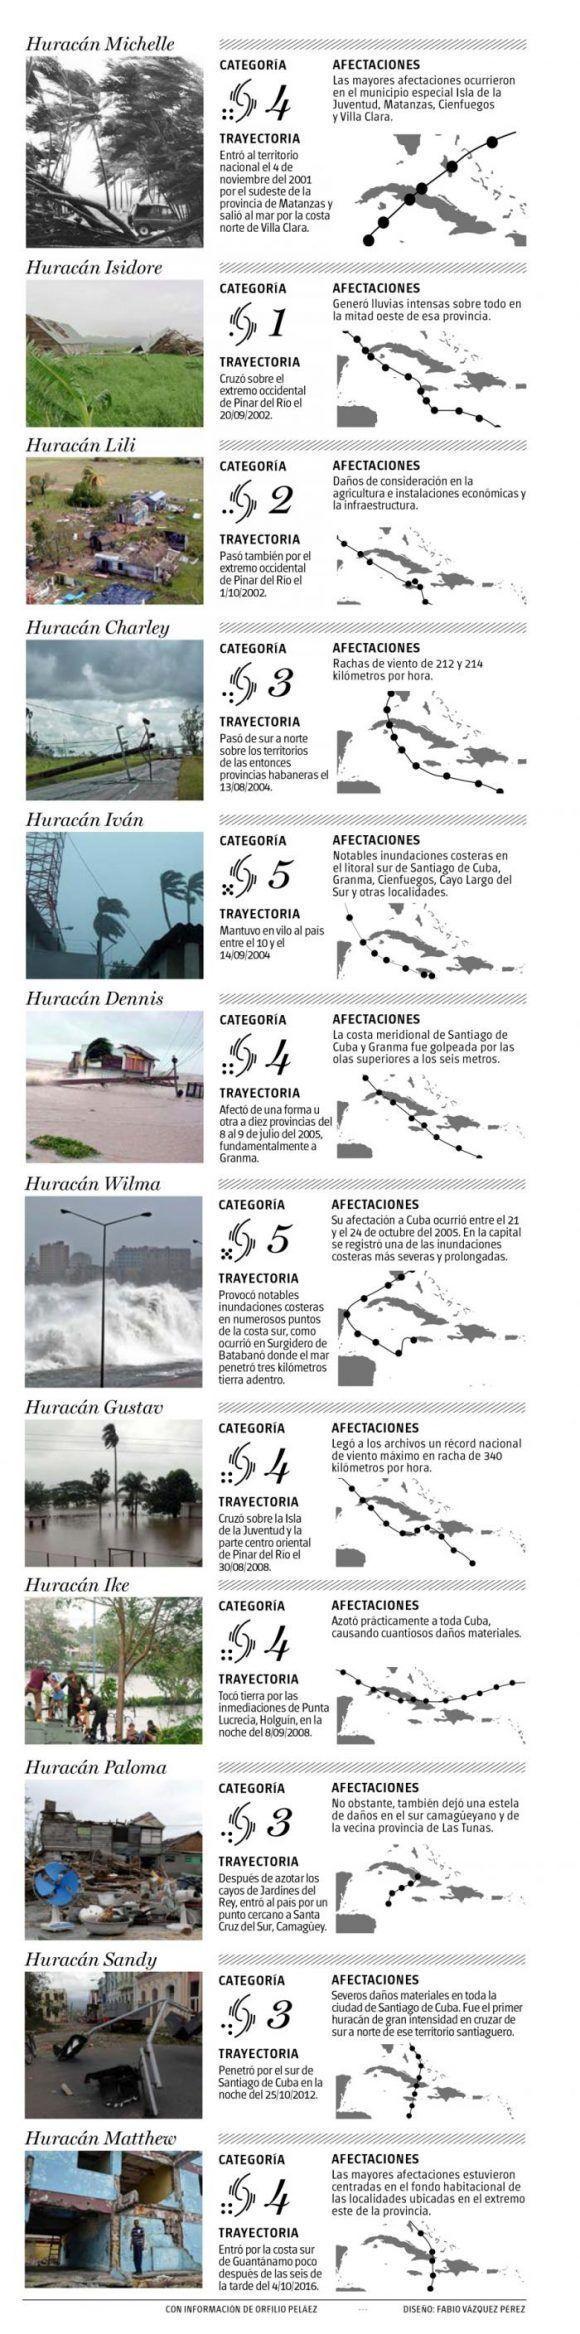 huracanes-en-cuba-inforgrafia